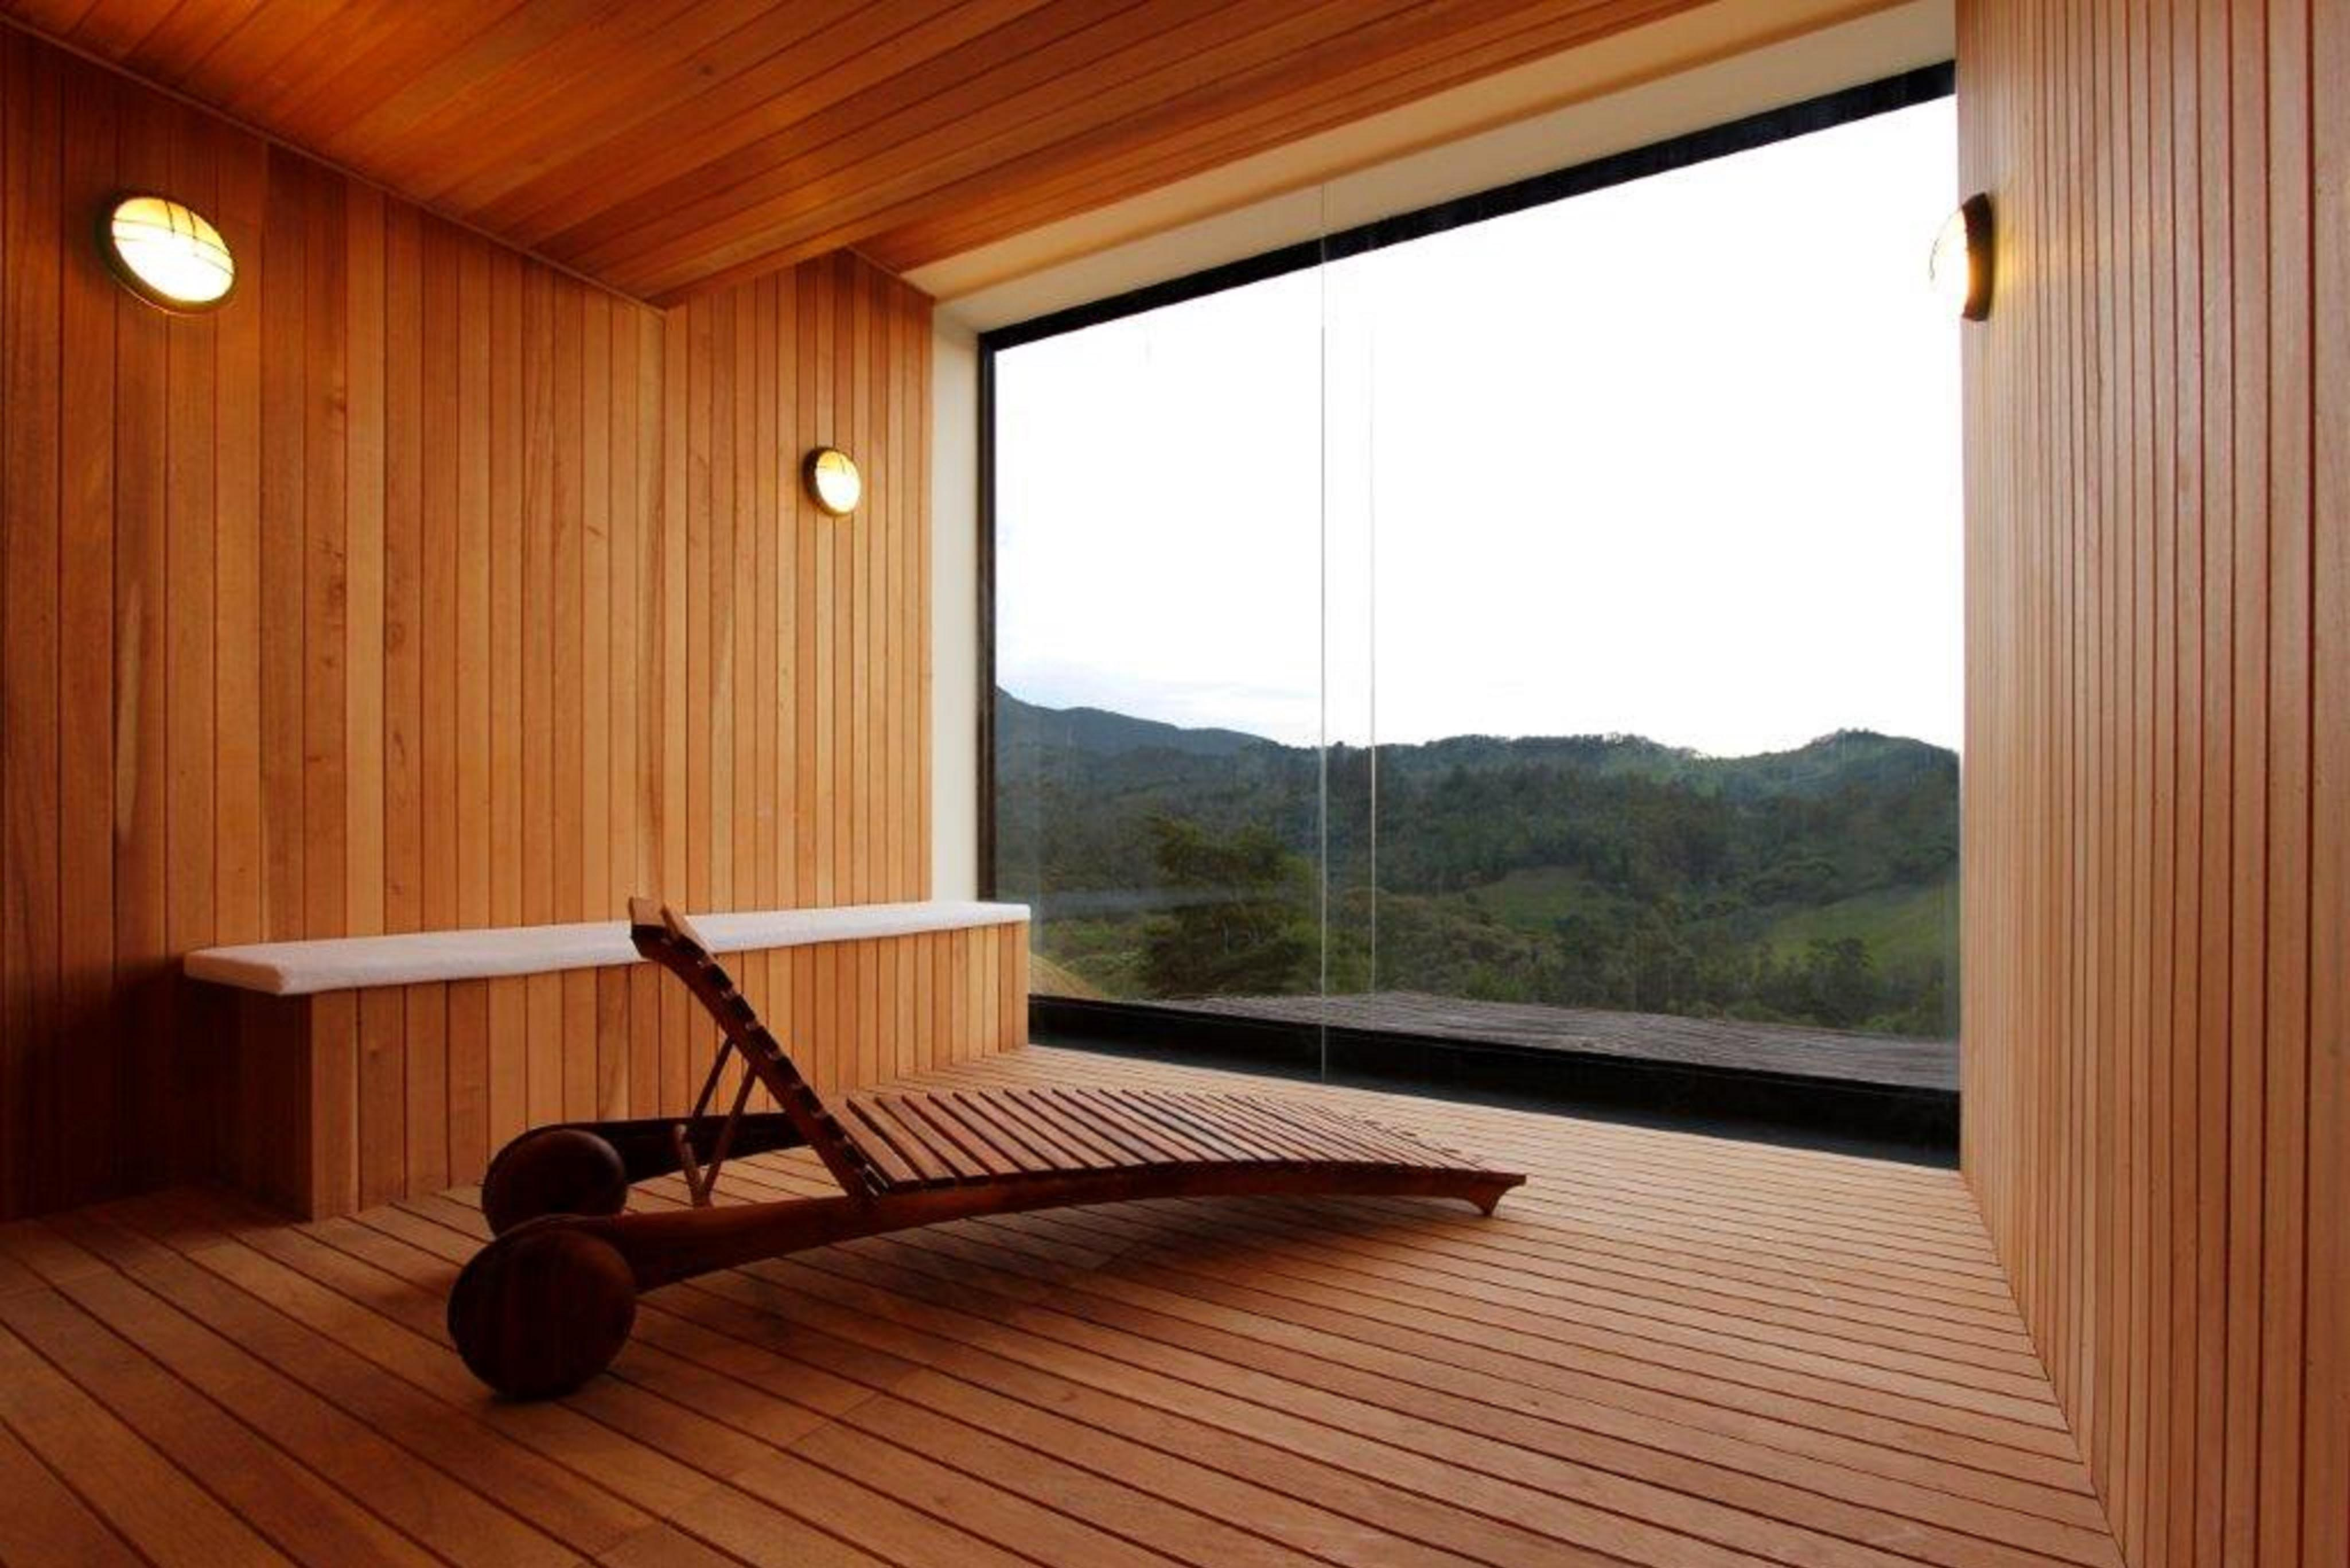 botanique hotel spa dagua campos